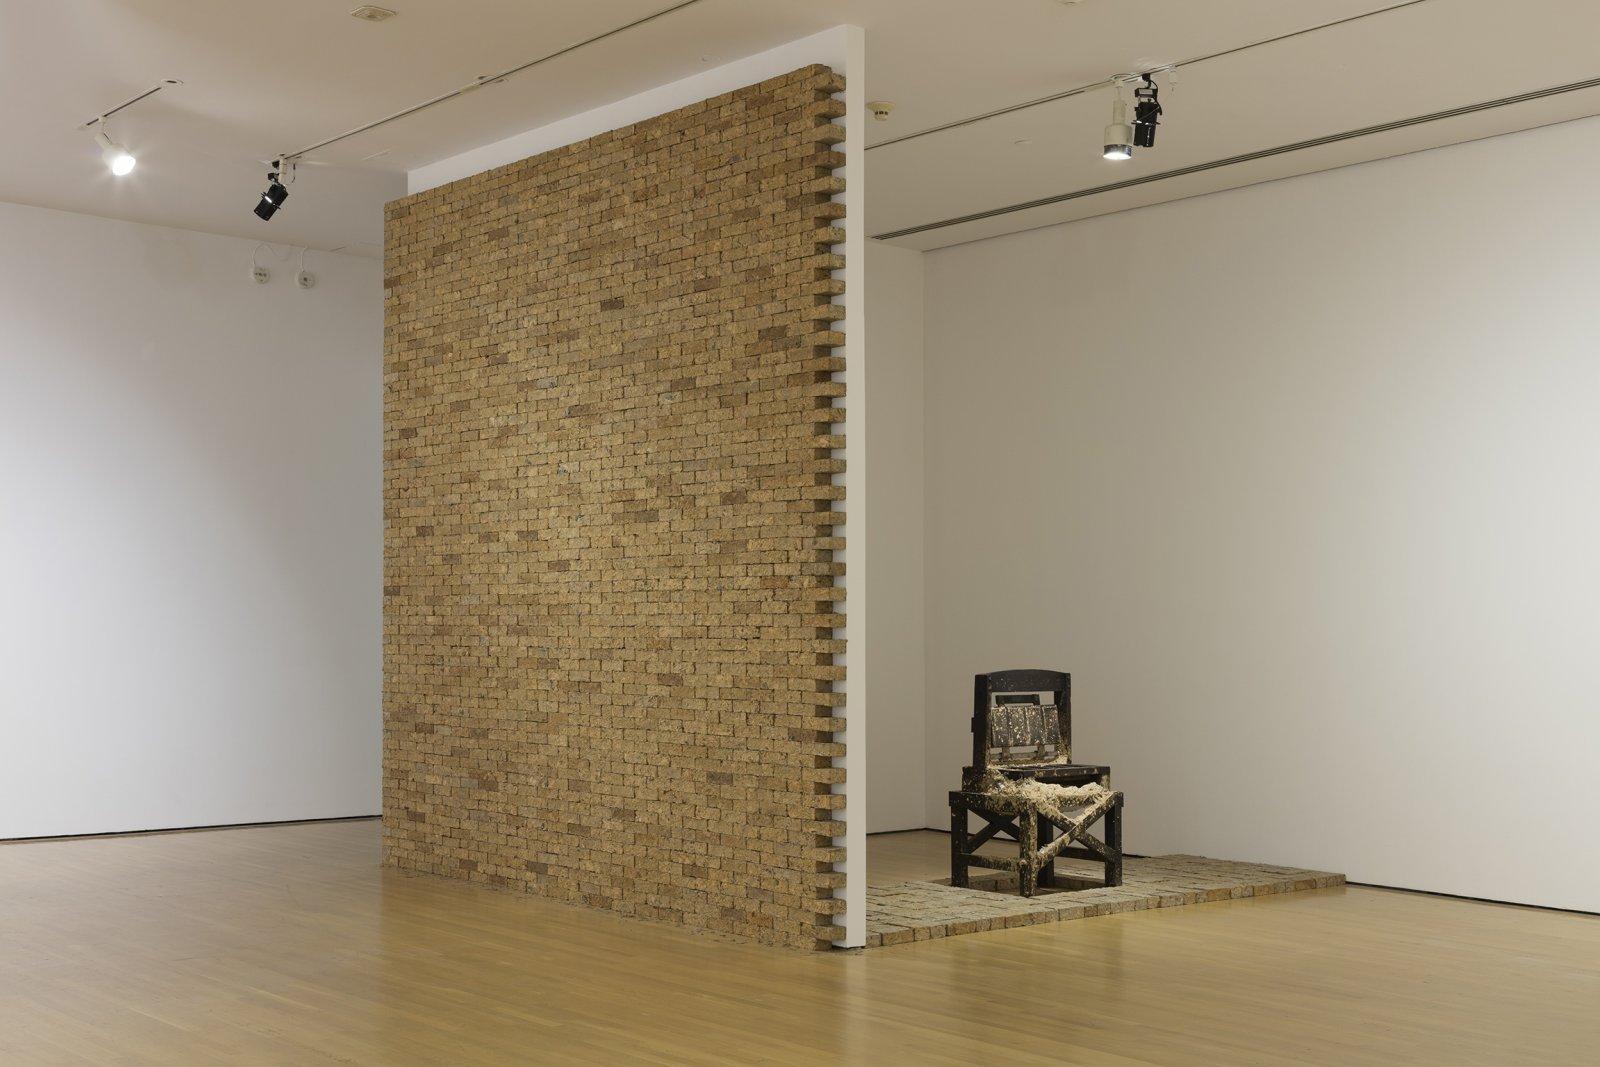 Liz Magor, Production, 1980, newspaper, wood, steel, approximately 2800 paper bricks, each 2 x 4 x 8 in. (5 x 10 x 20 cm), machine: 53 x 32 x 24 in. (135 x 81 x 61 cm) by Liz Magor